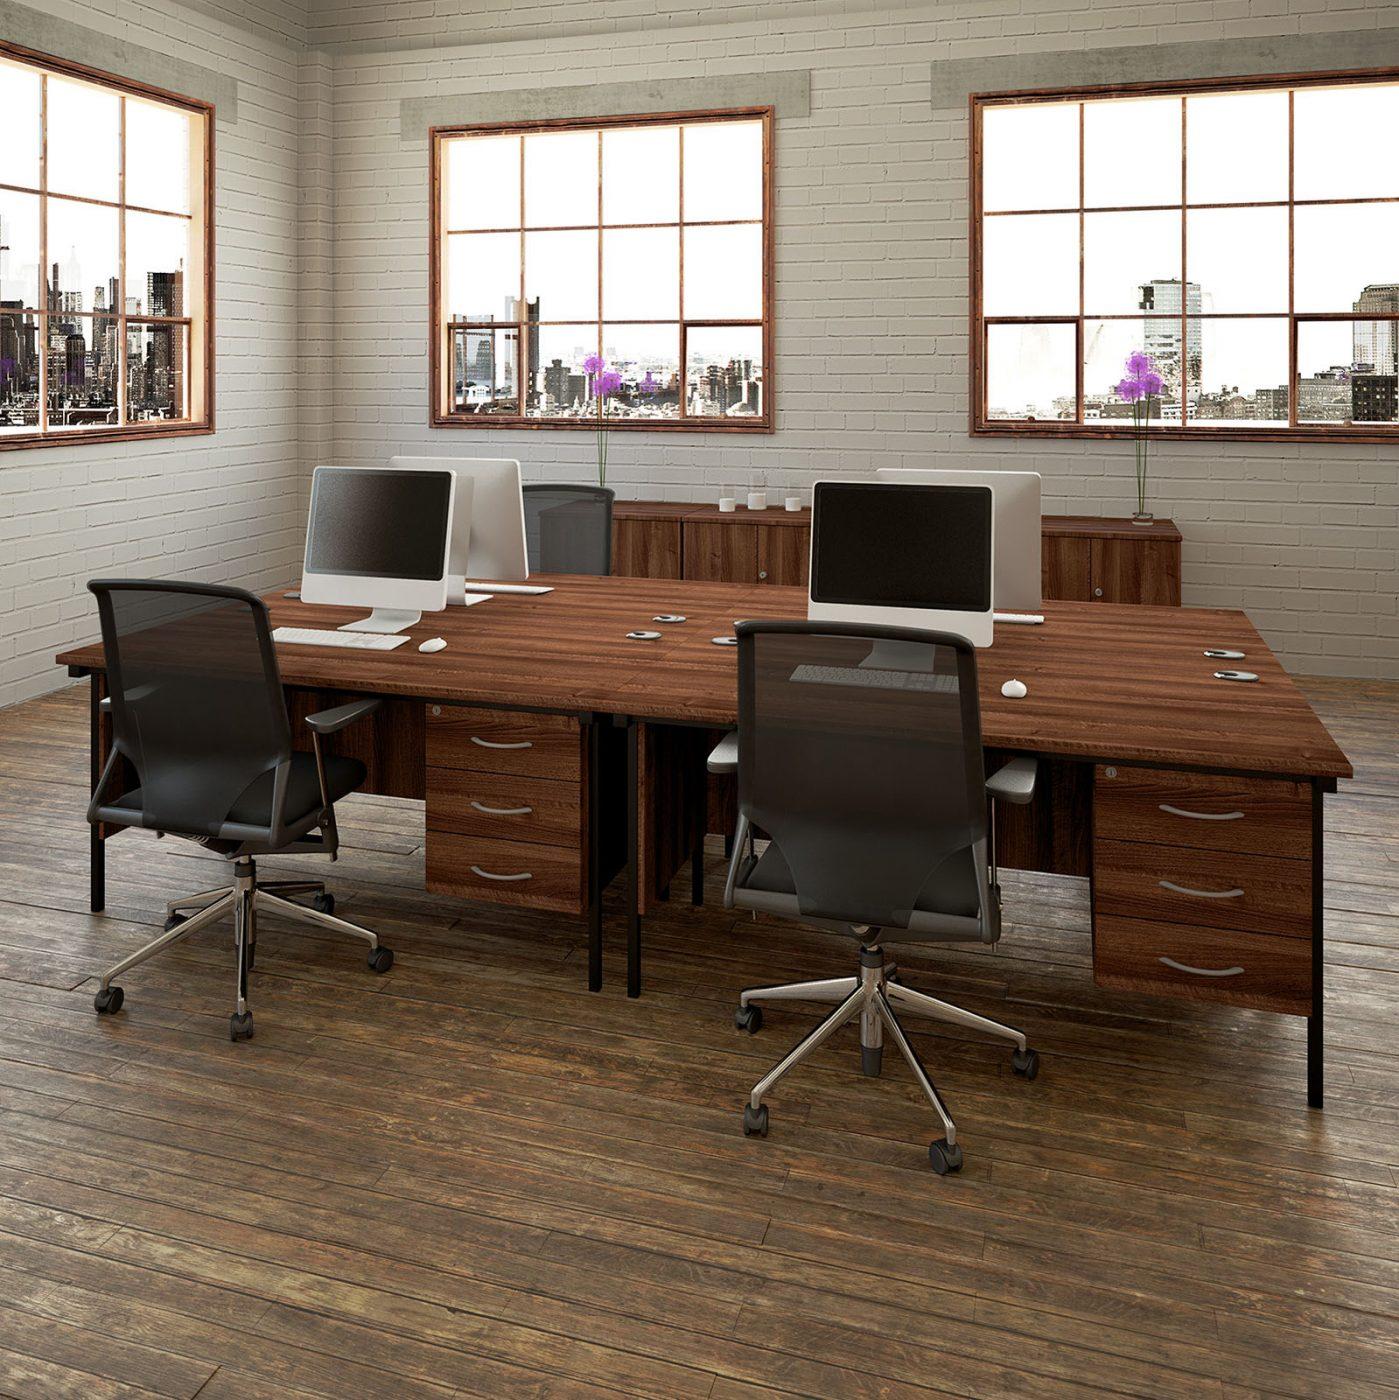 paolo desk, walnut desk, MFC, teacher desk, basic desk, storage